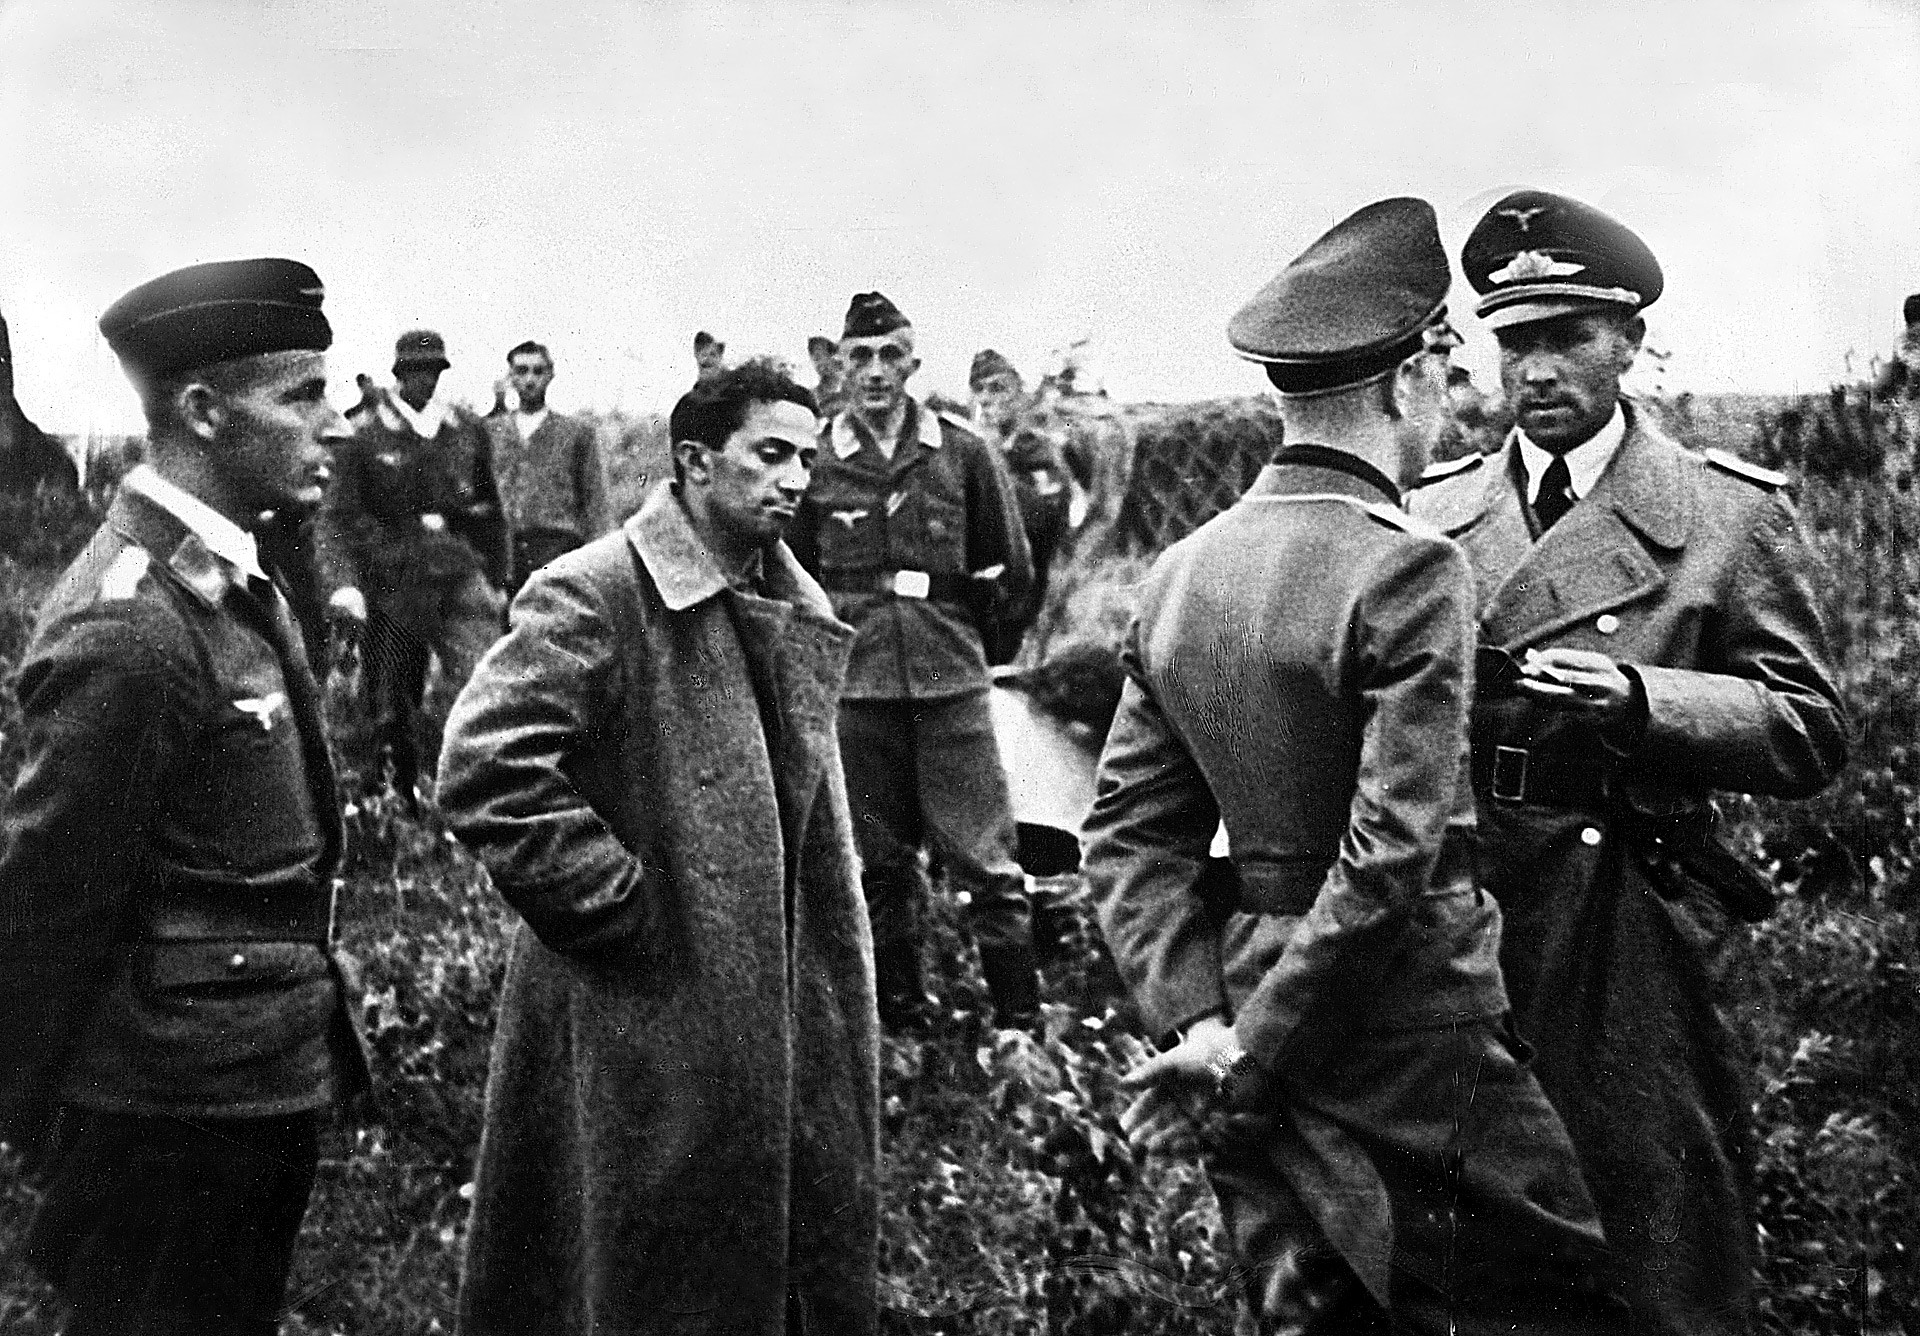 Jakow Dschugaschwili, Stalins ältester Sohn